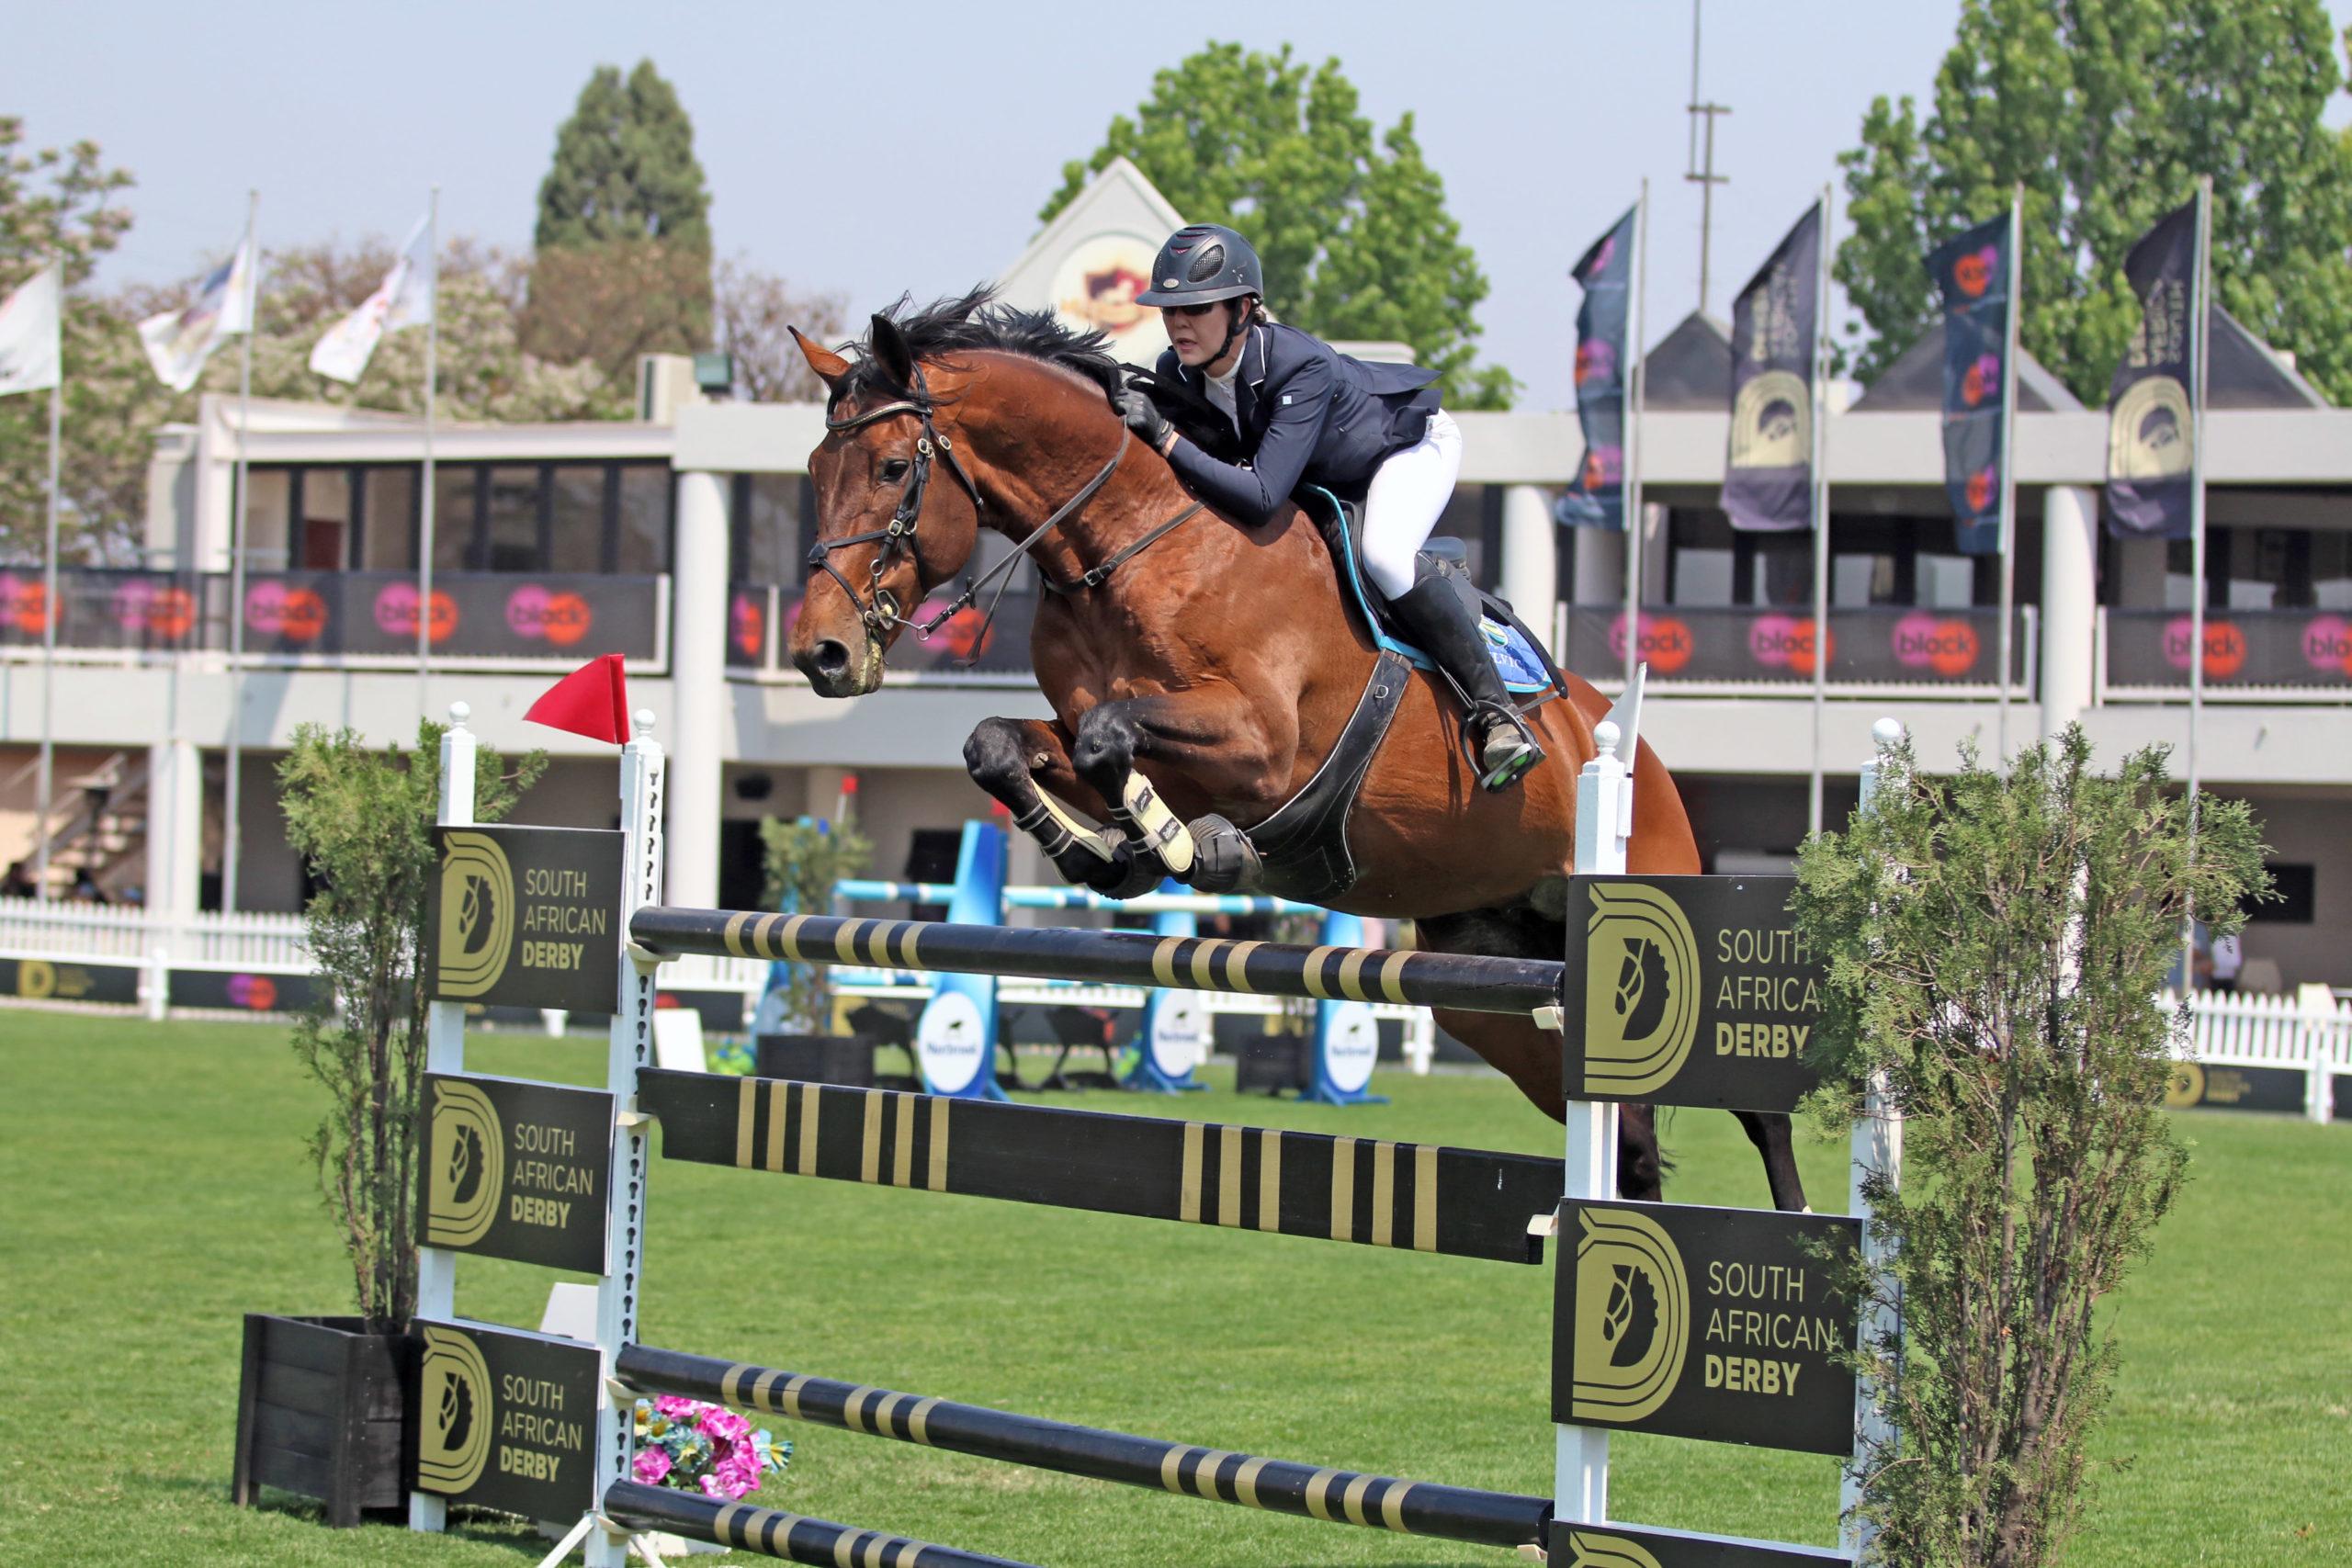 The SA Derby rider profiles: Nicola Sime-Riley